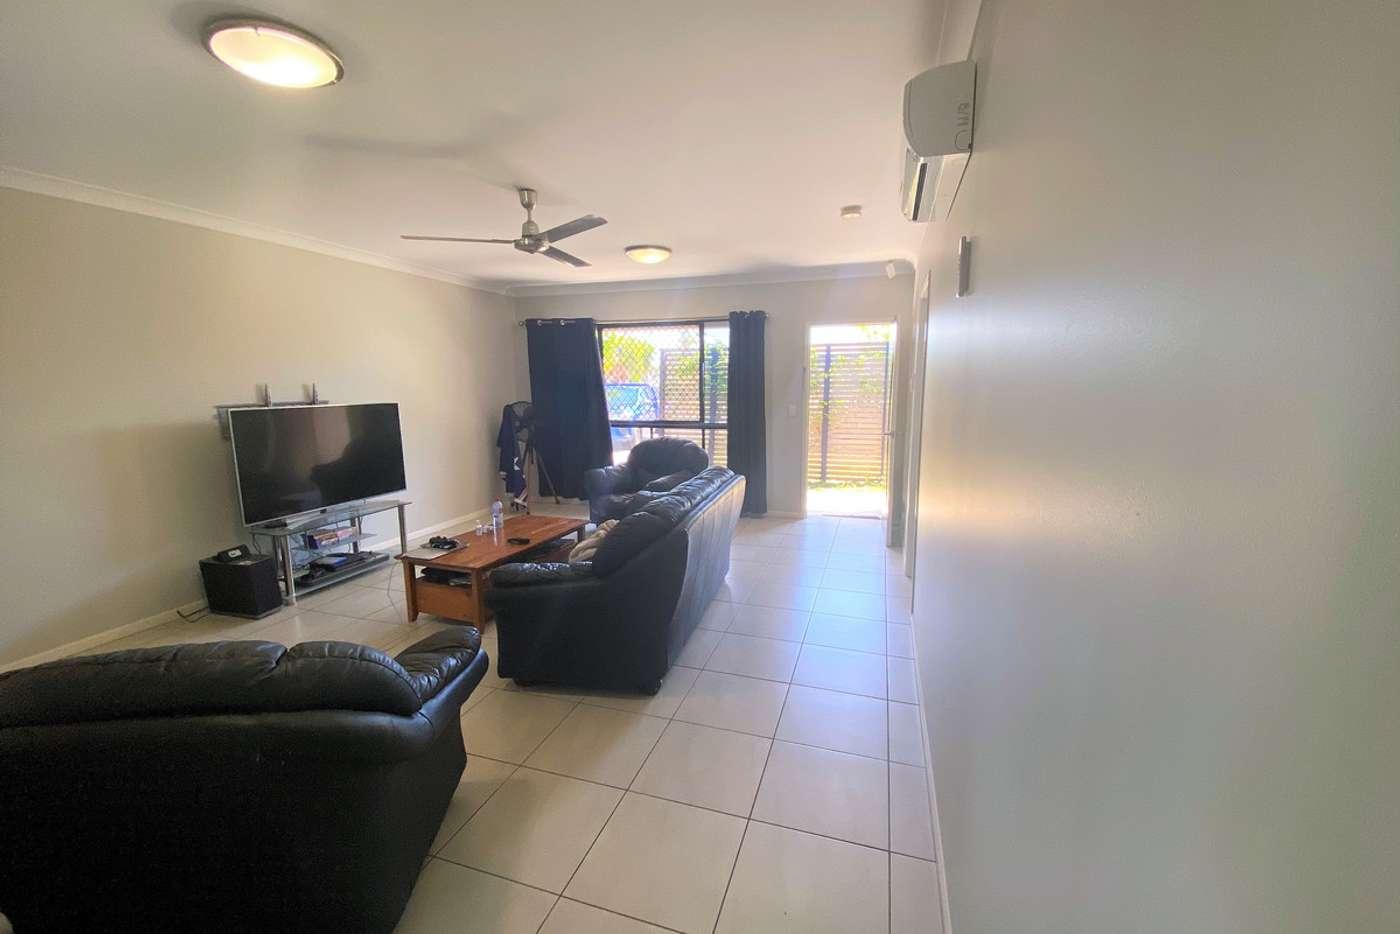 Sixth view of Homely house listing, 7 Eli Close, Mareeba QLD 4880